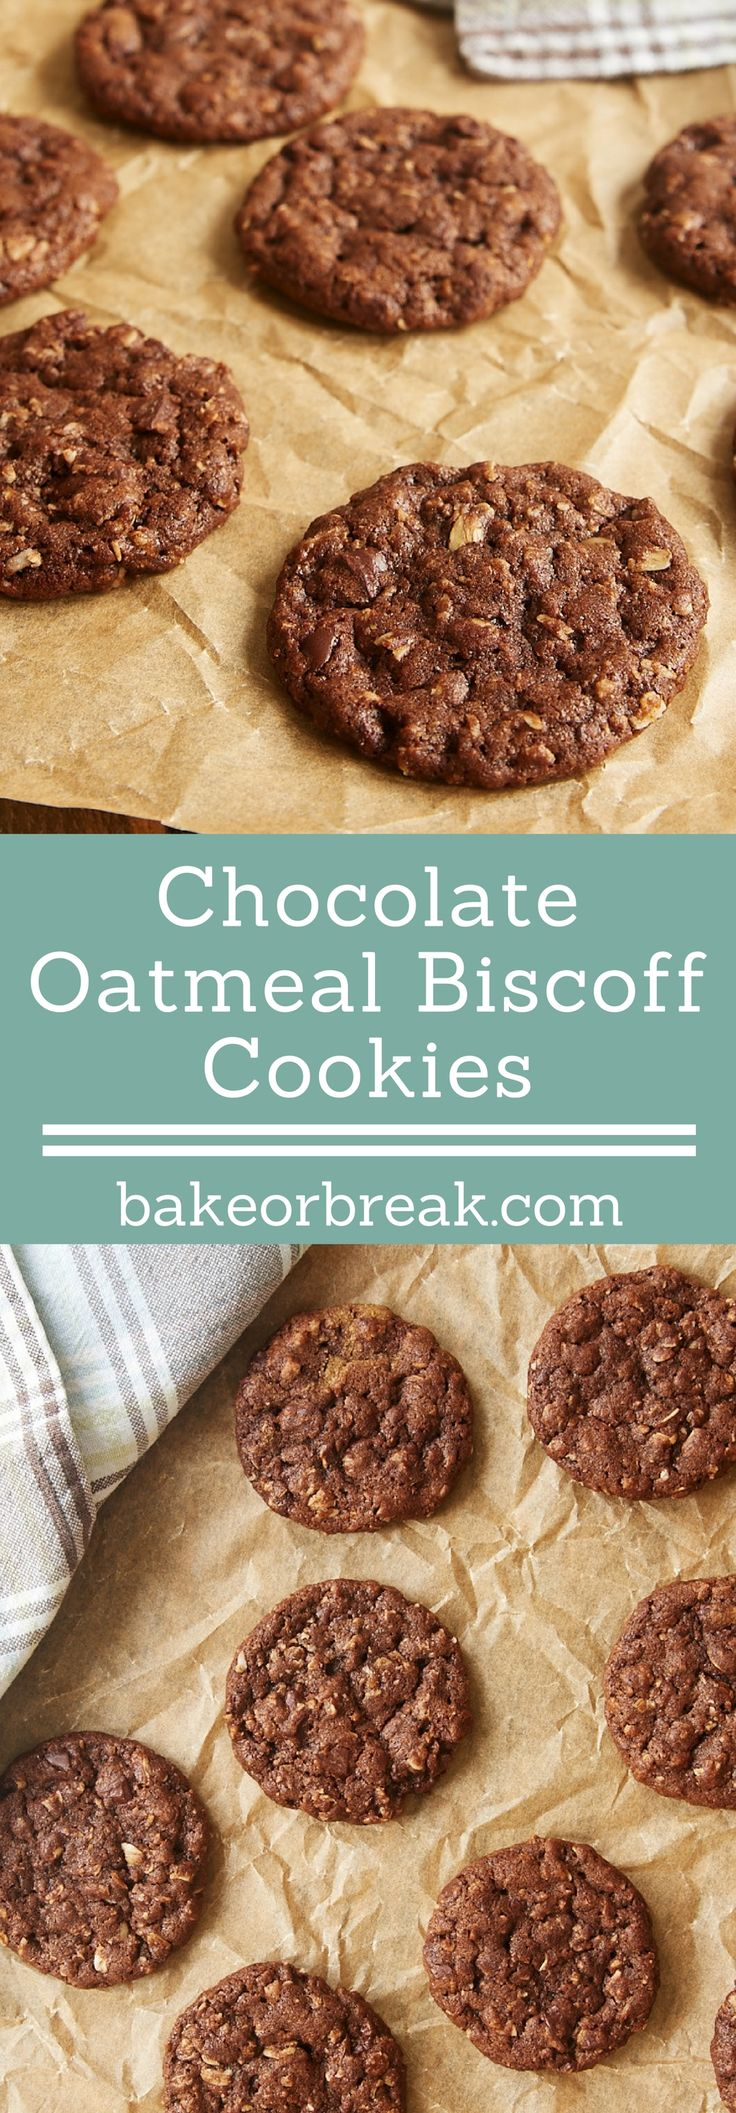 how to make sweet oatmeal